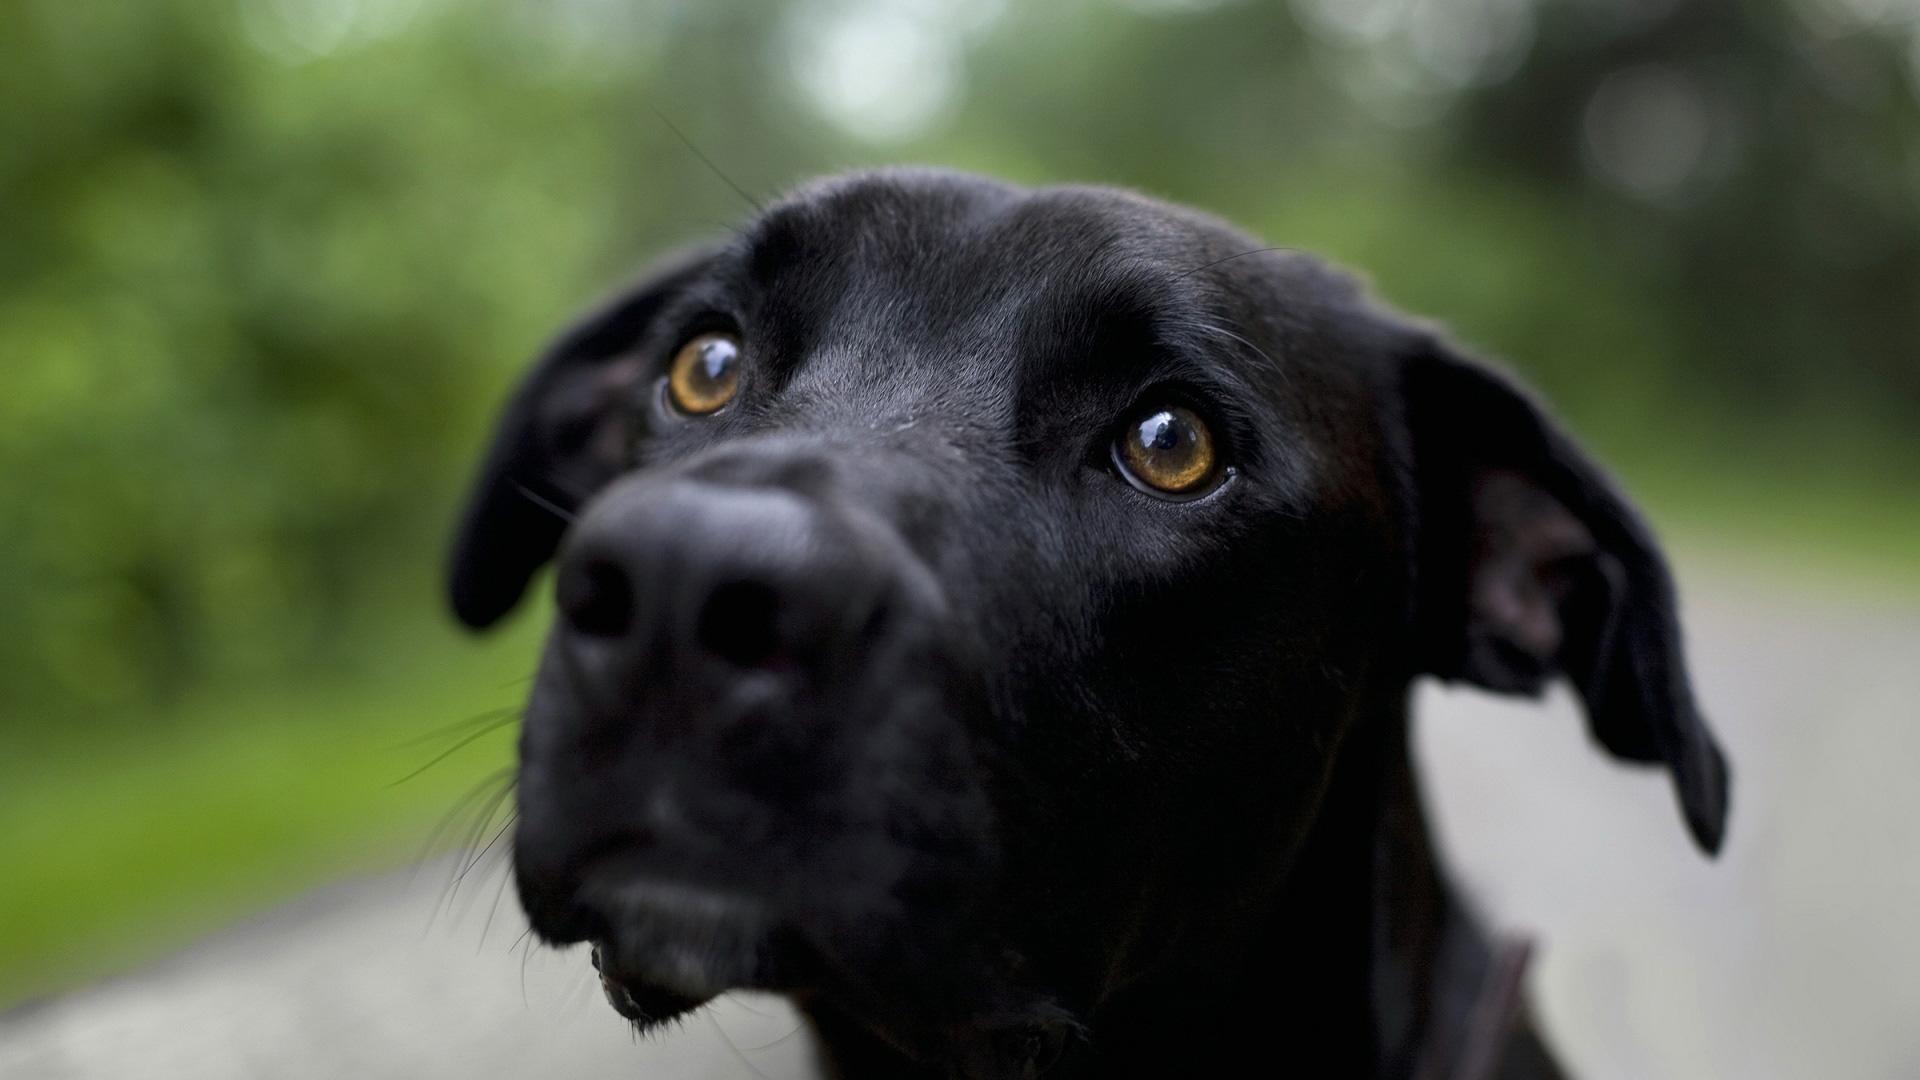 Black Dog   1920x1080   169 1920x1080